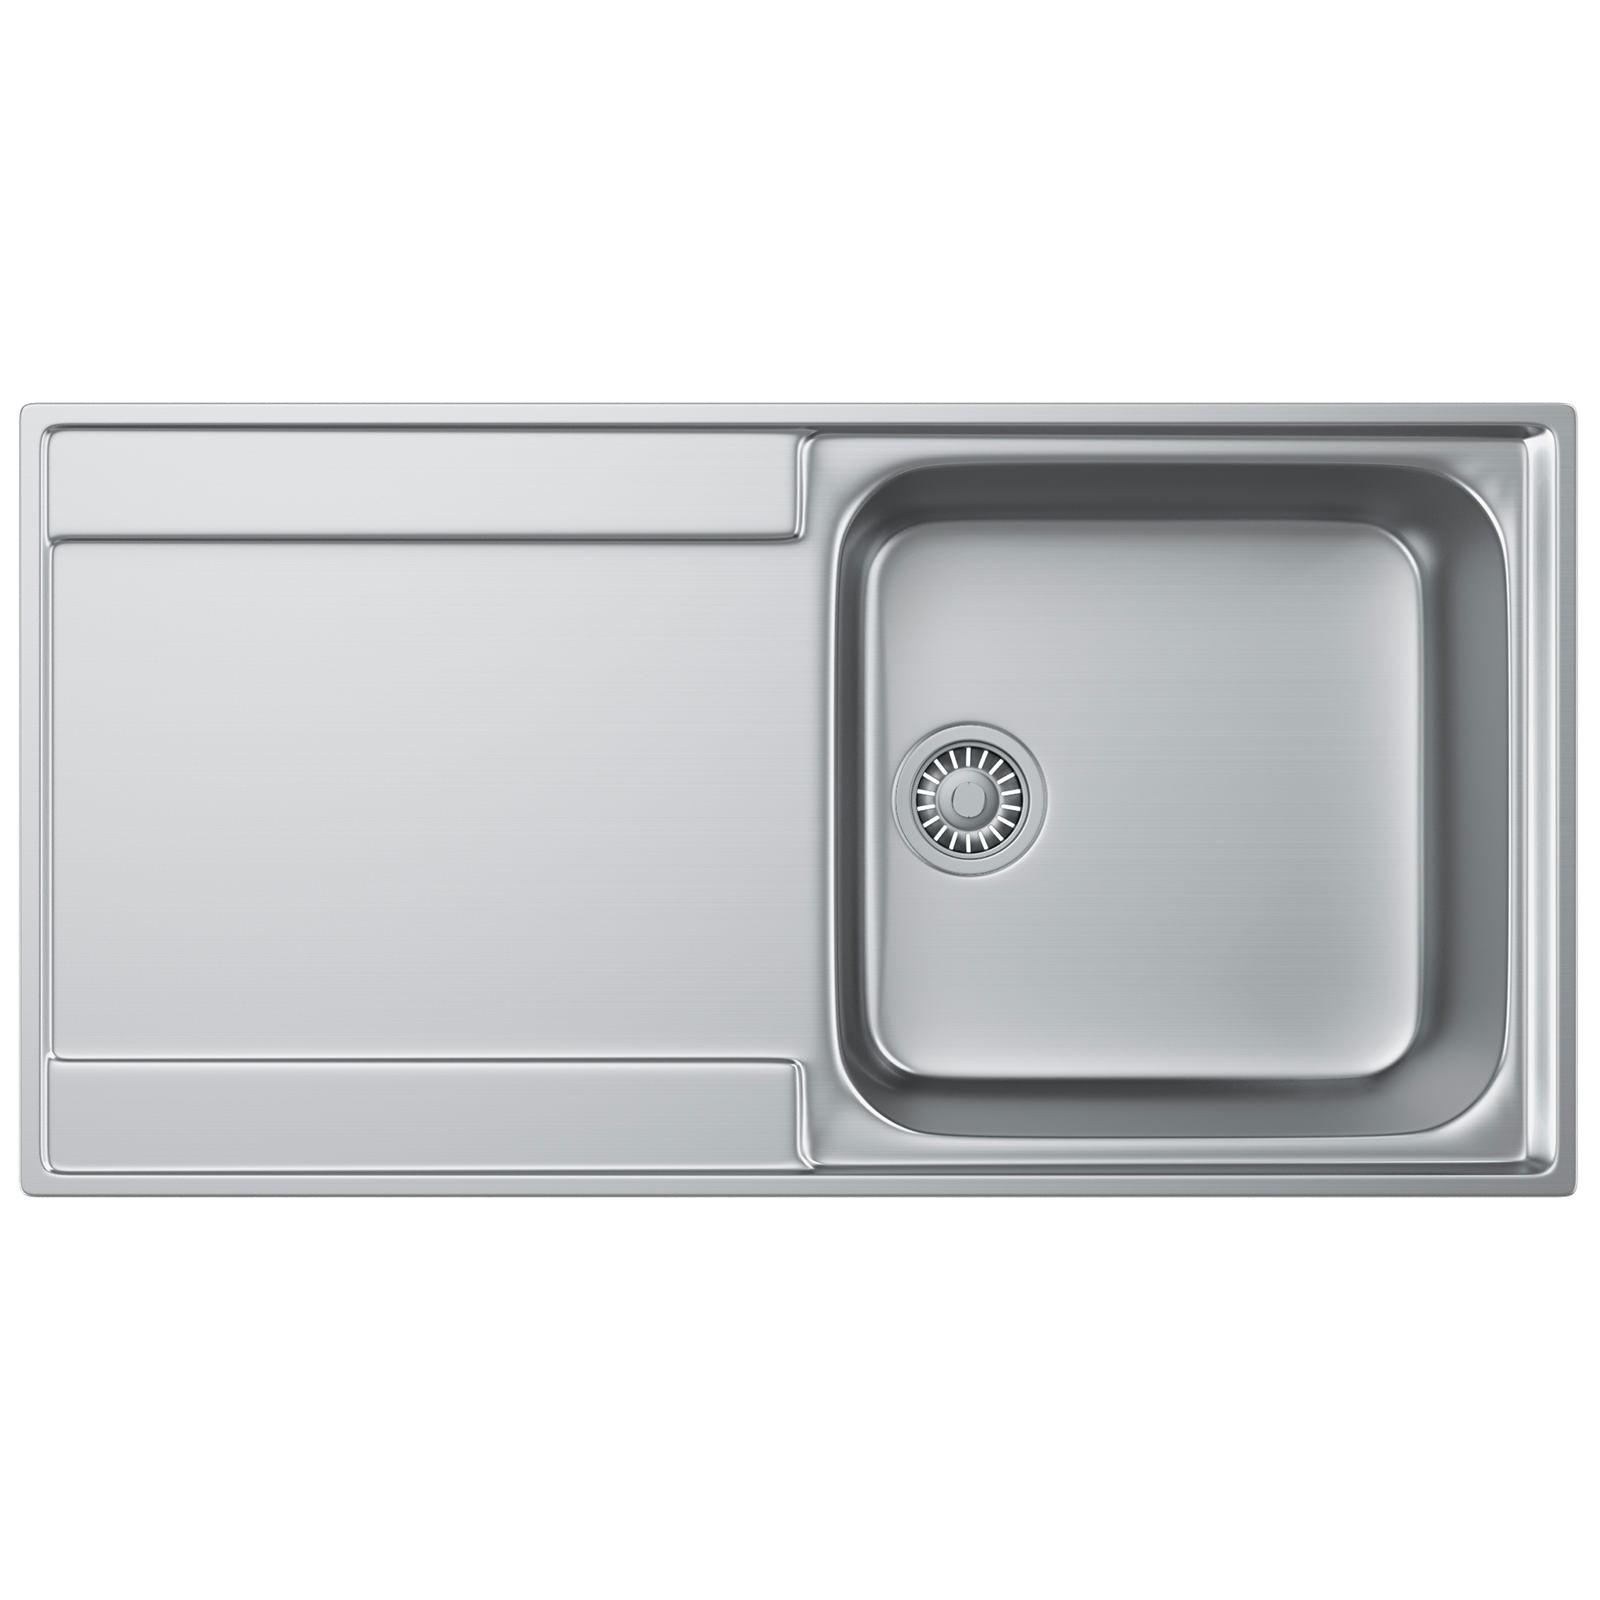 Franke Inset Sink : Franke Maris Slim-Top MRX 211 Stainless Steel 1.0 Bowl Inset Sink ...